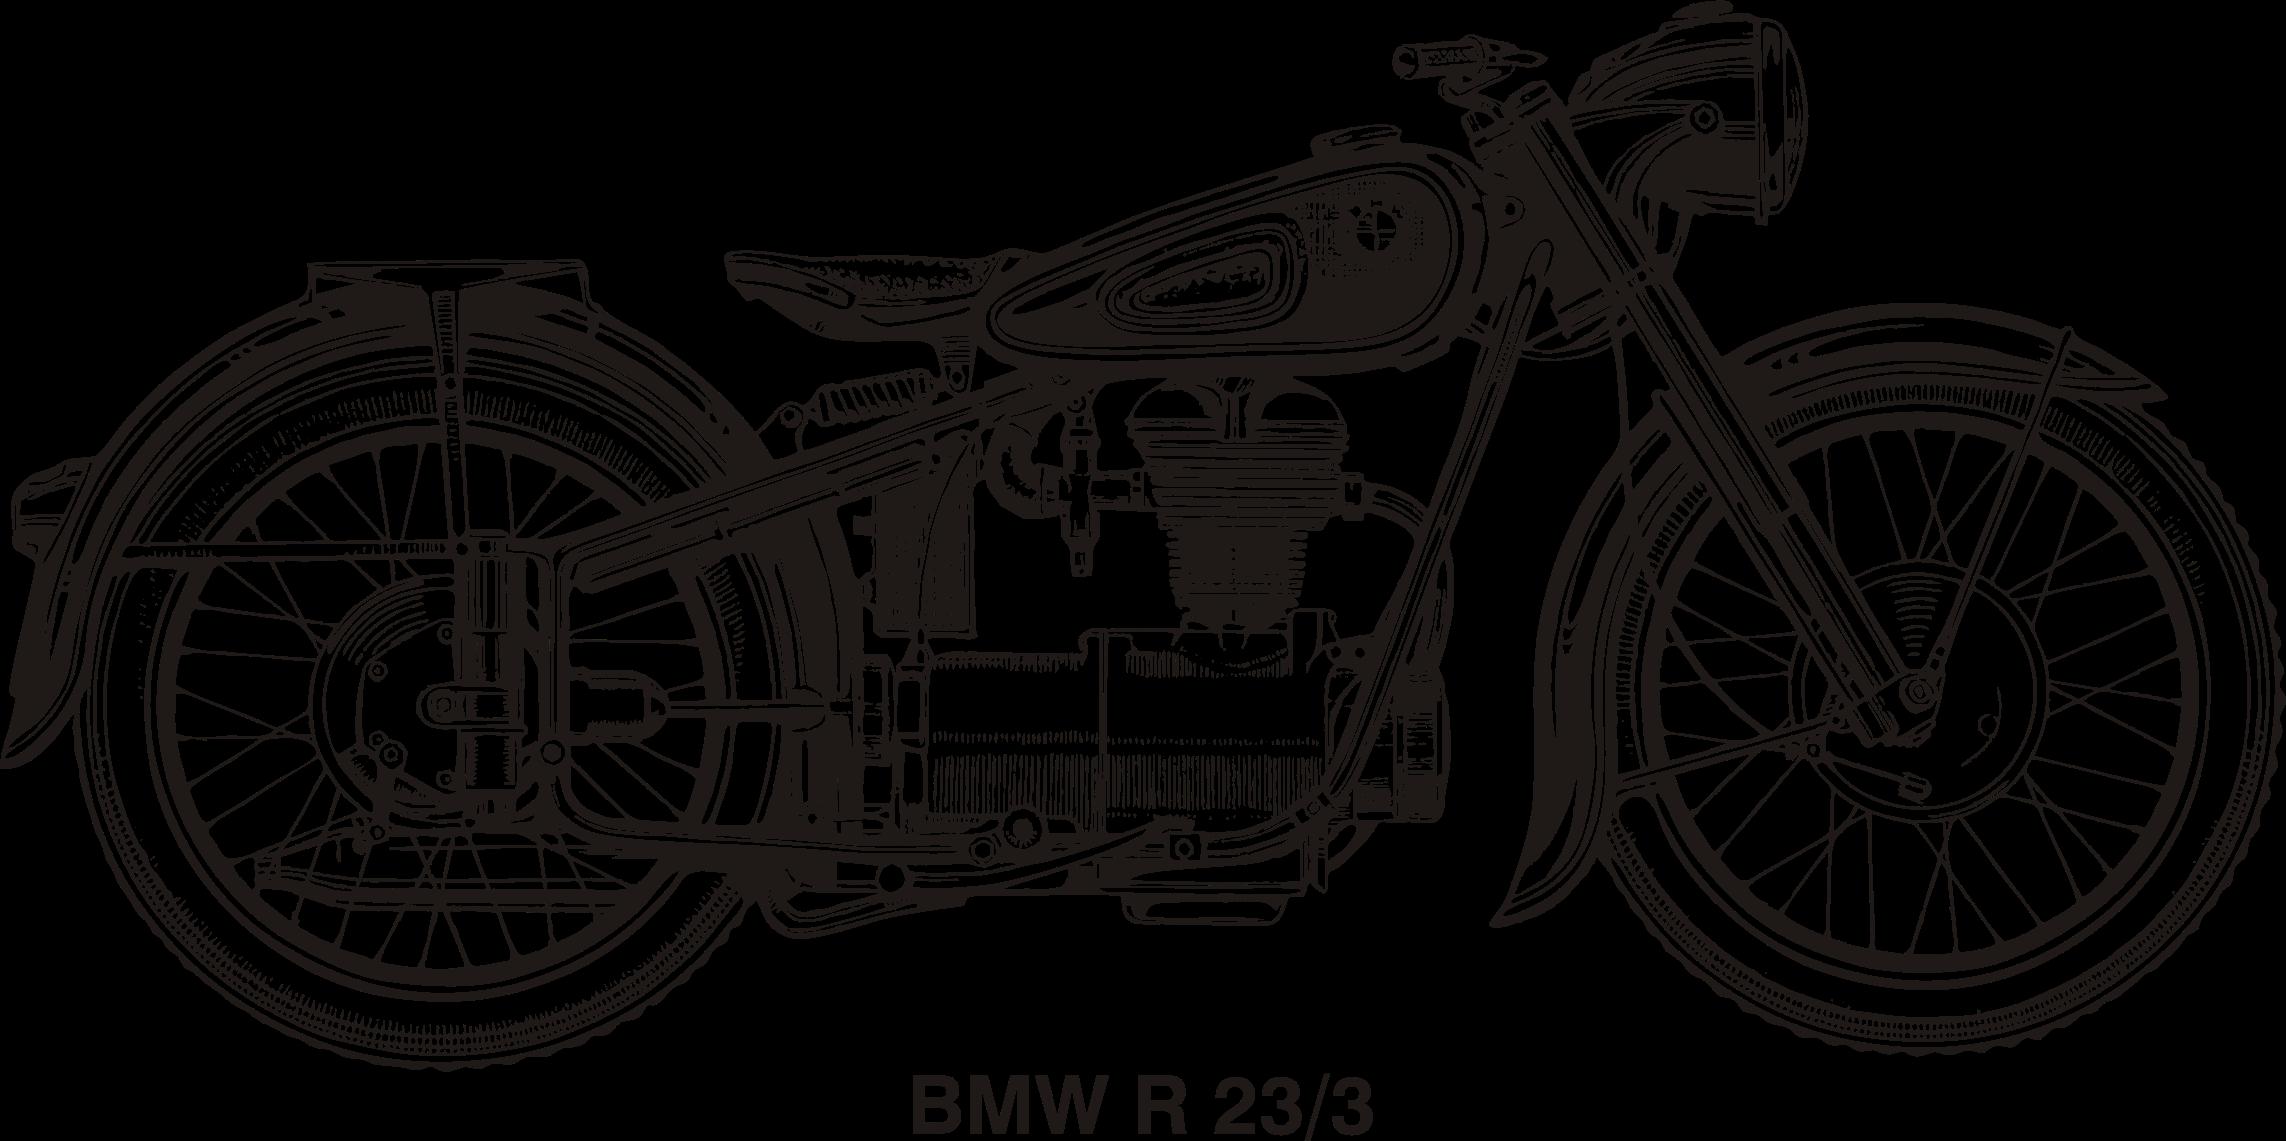 BMW R25/3, year 1953 by @Vanja, historical BMW motorcycle